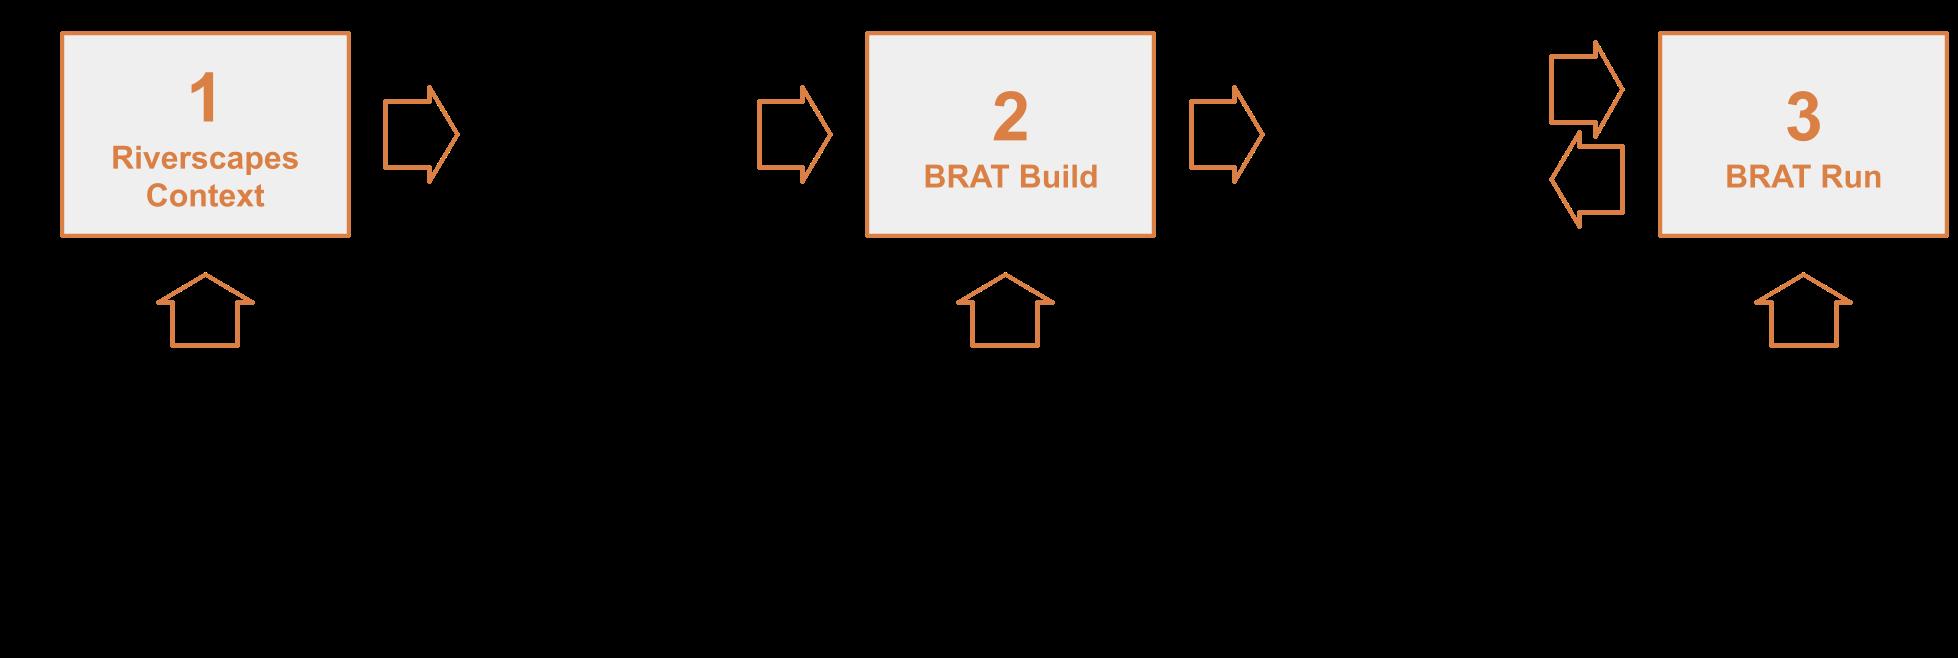 BRAT Steps